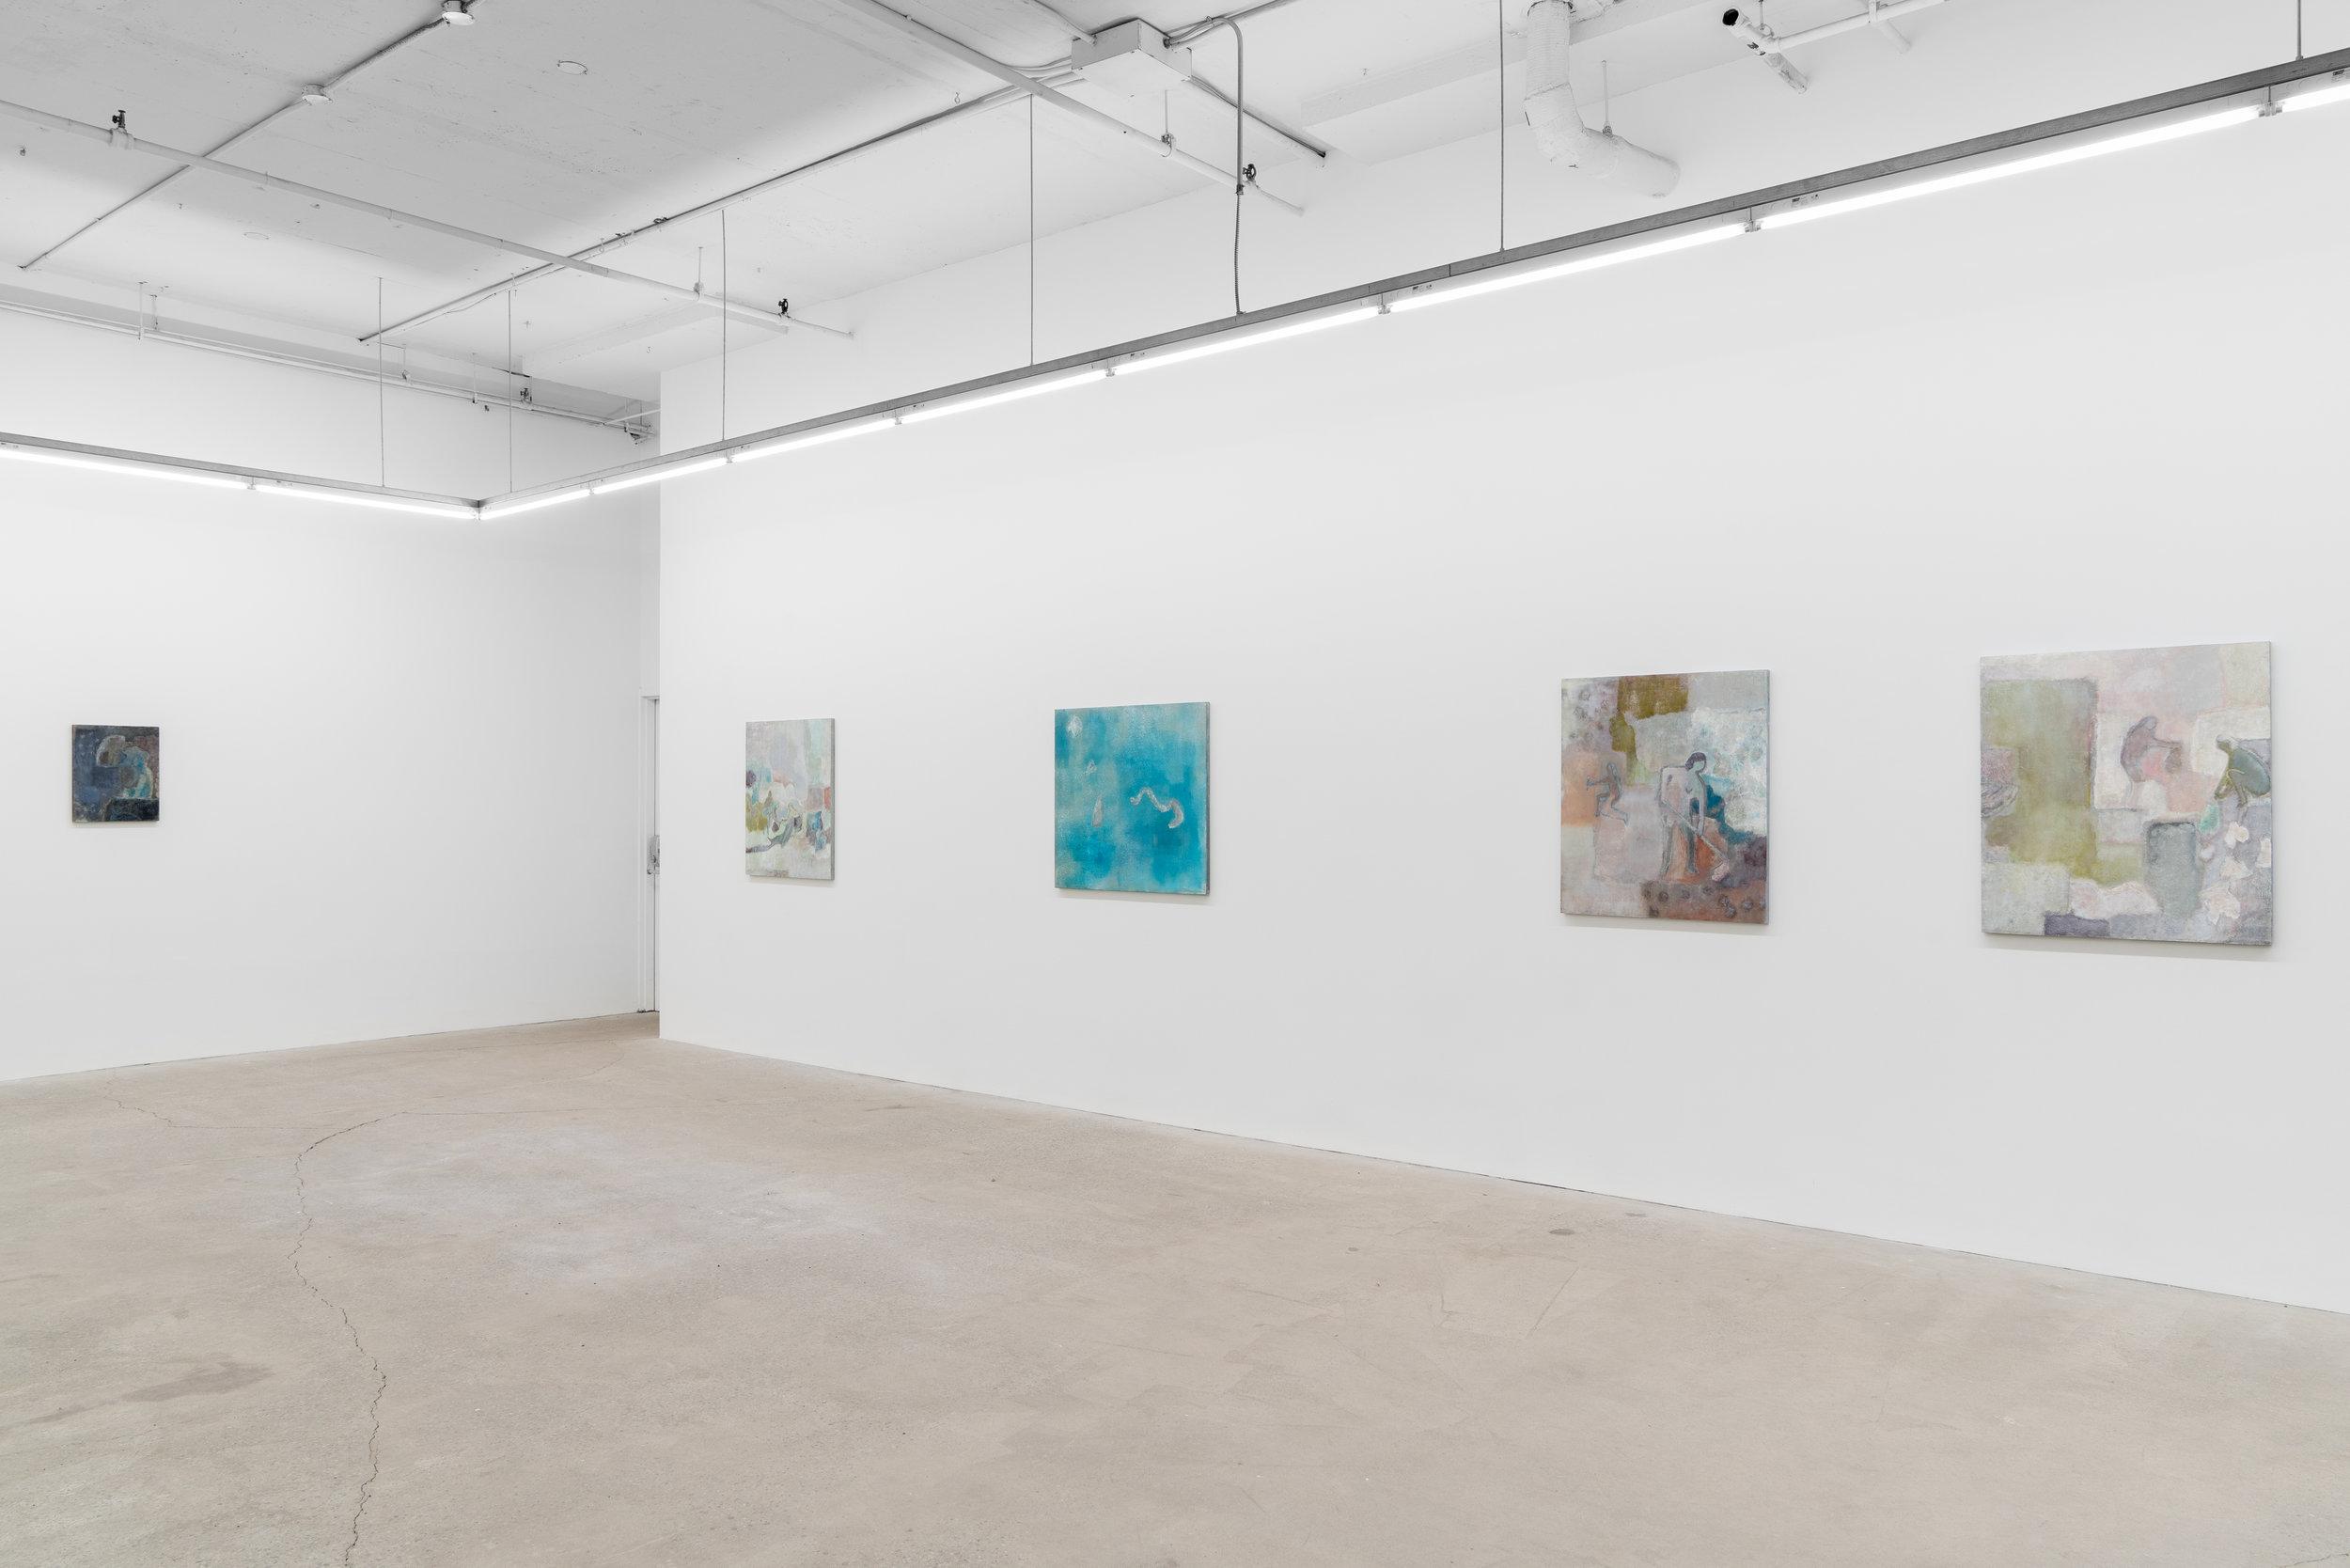 GalerieNicolasRobertNovembre2018 (18 of 27).jpg